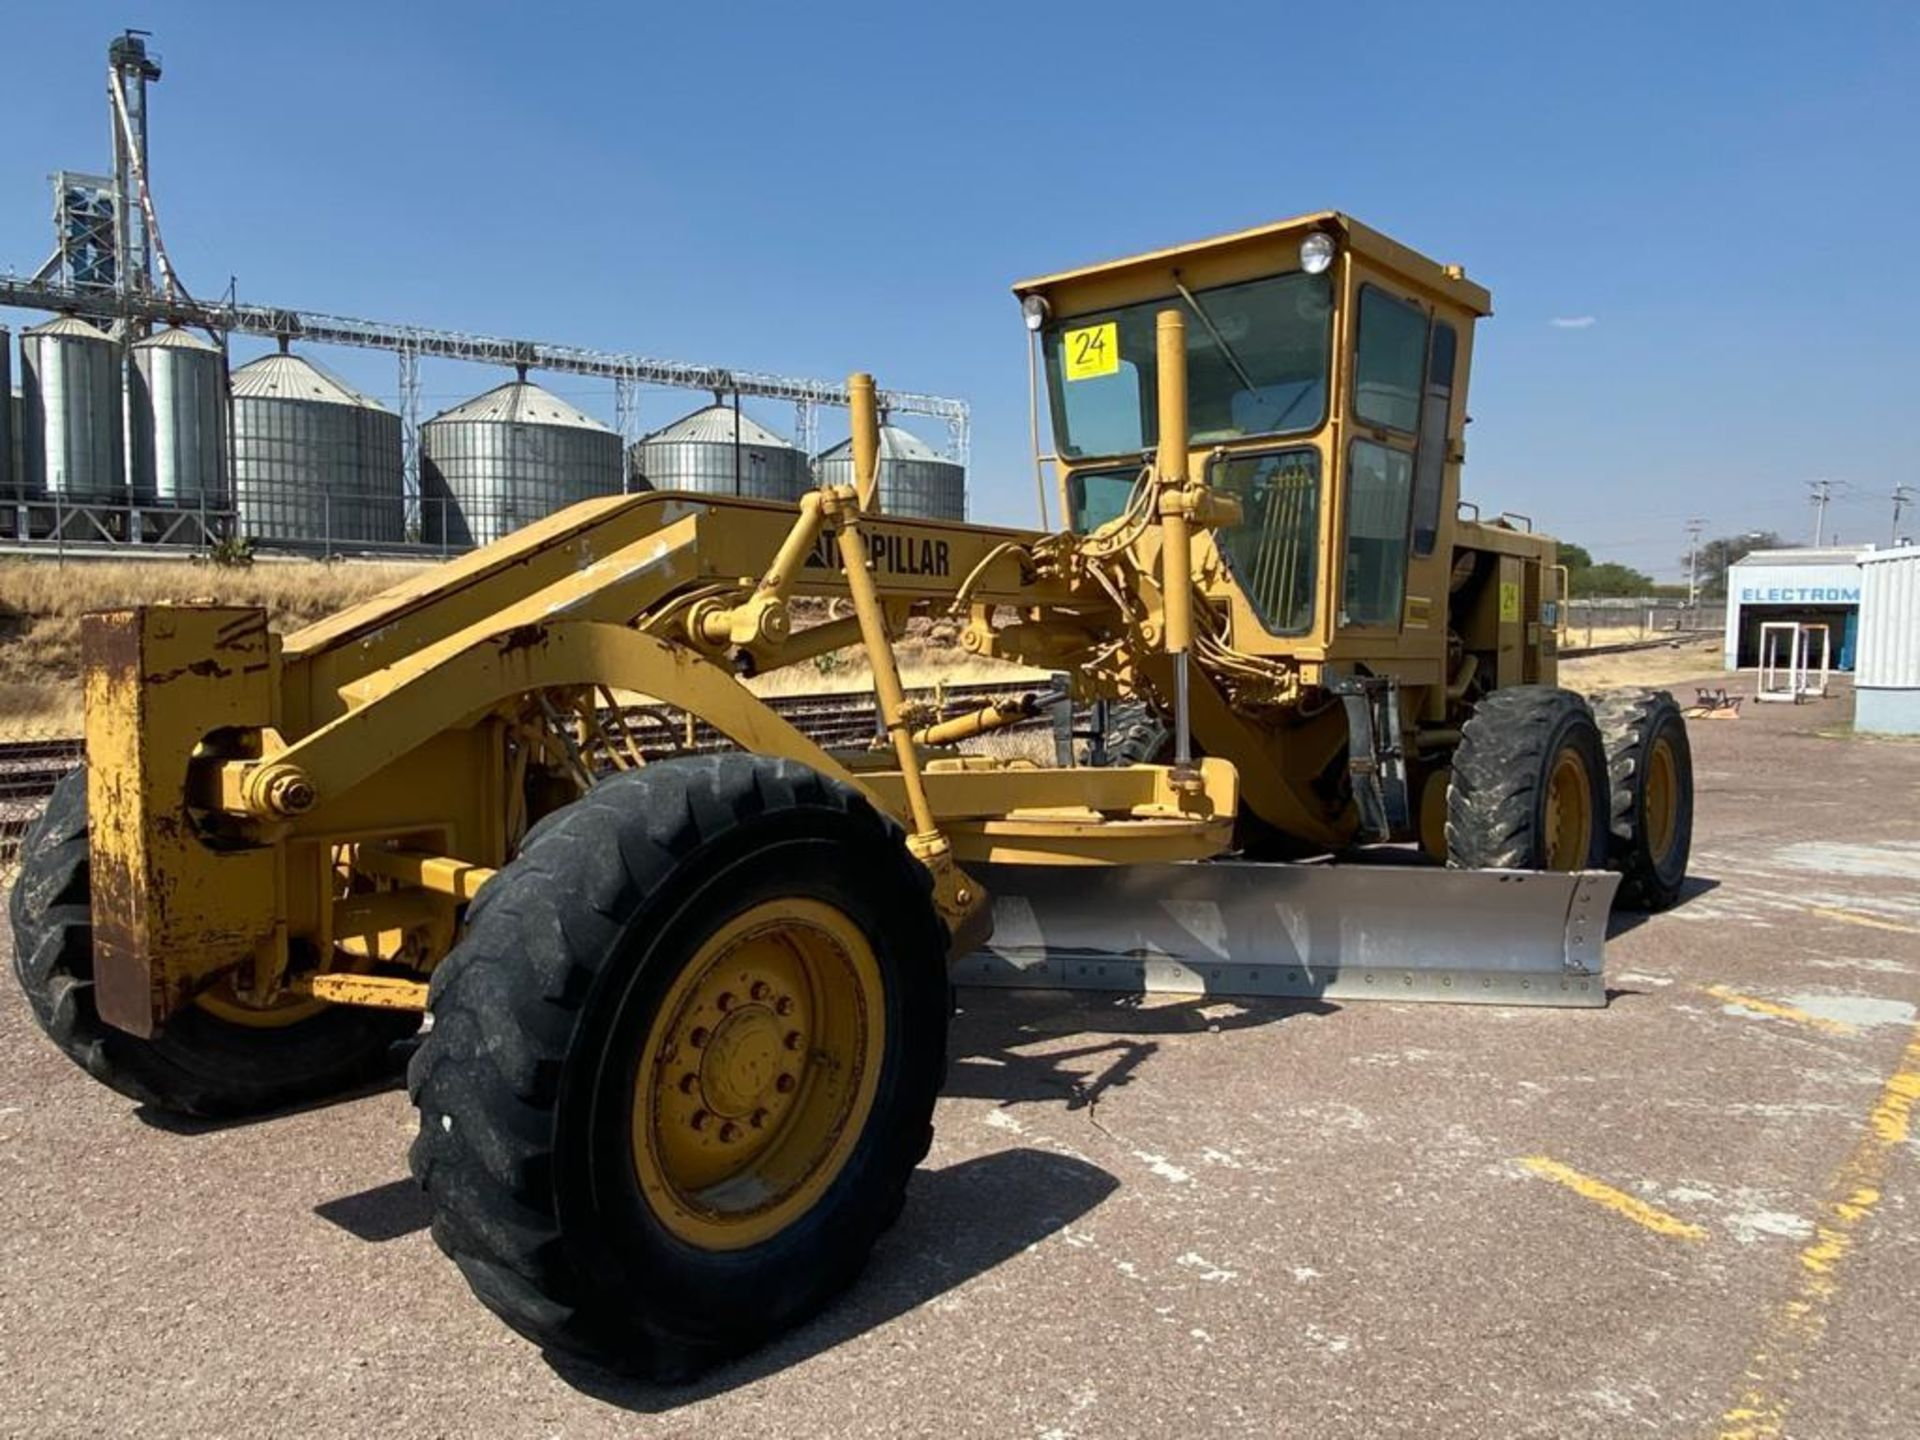 Caterpillar 120G Motor Grader, Serial number 87V09646, Motor number PQ883-2/07Z28983 - Image 48 of 61